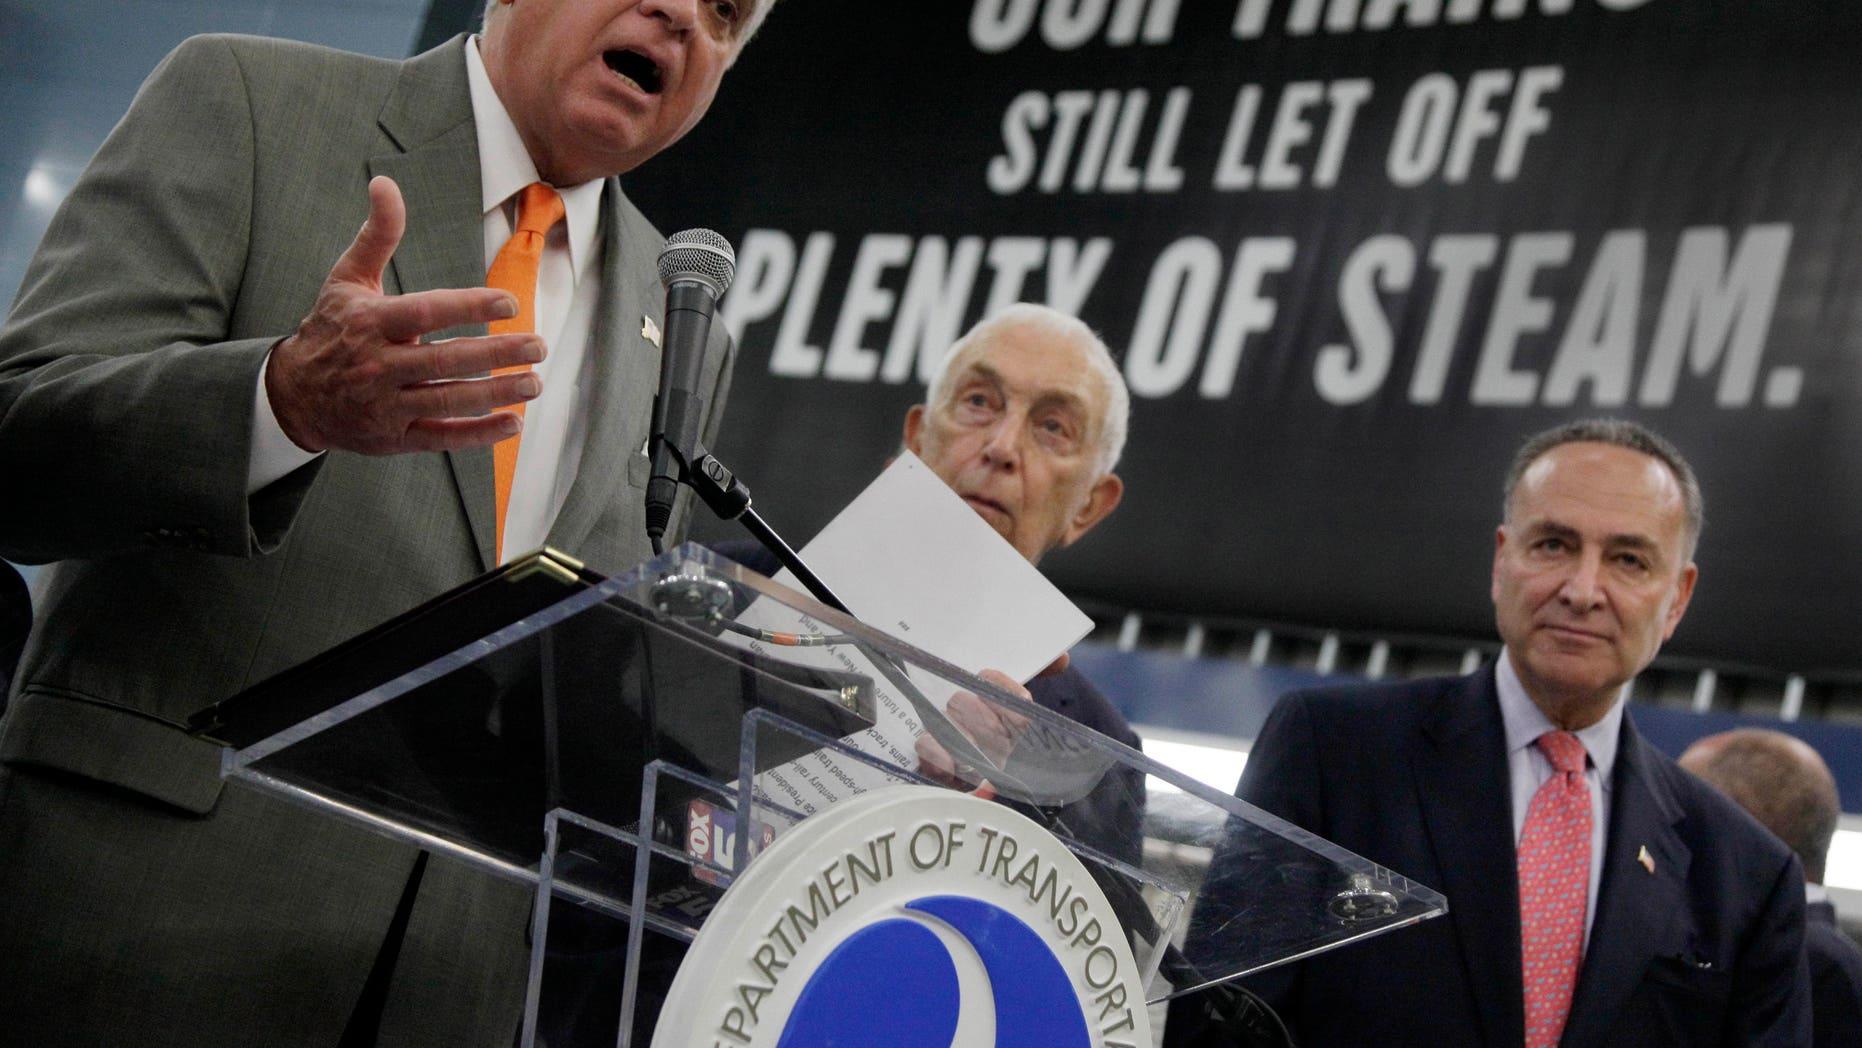 Monday: Sen. Charles Schumer, right, and Sen. Frank Lautenberg look on as U.S. Transportation Secretary Ray LaHood announces new rail funding at New York' Pennsylvania Station.